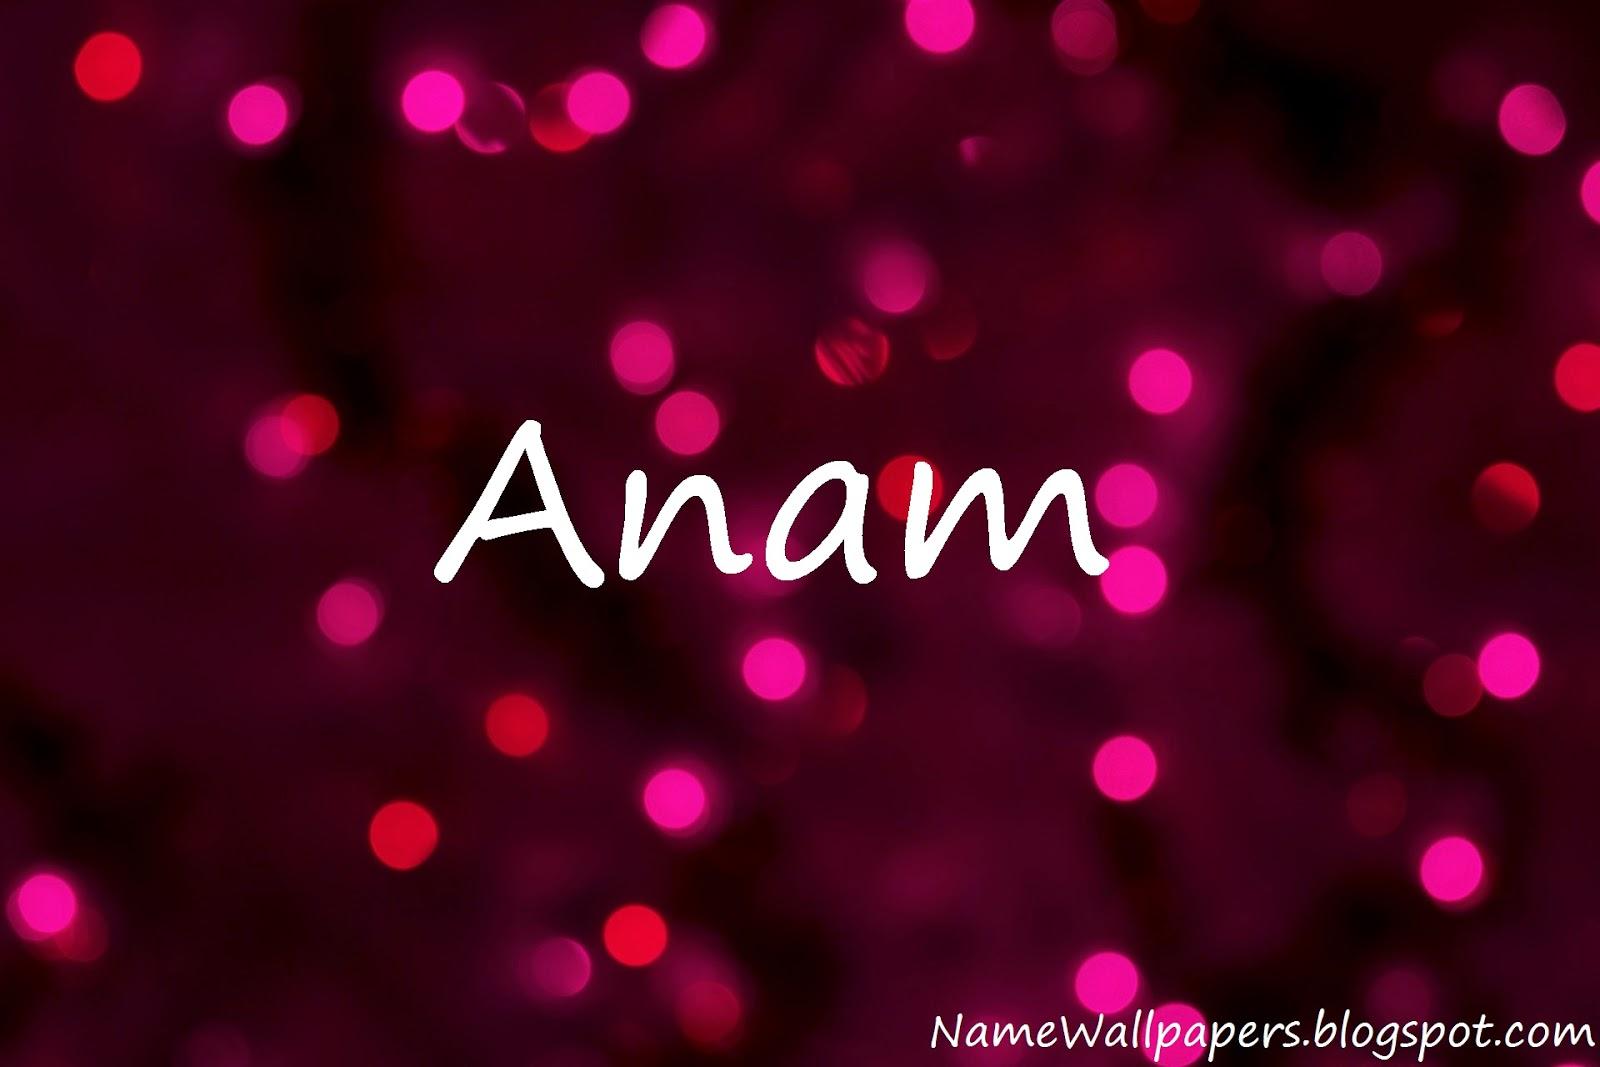 Anam Name Wallpapers A...K M Name Wallpaper